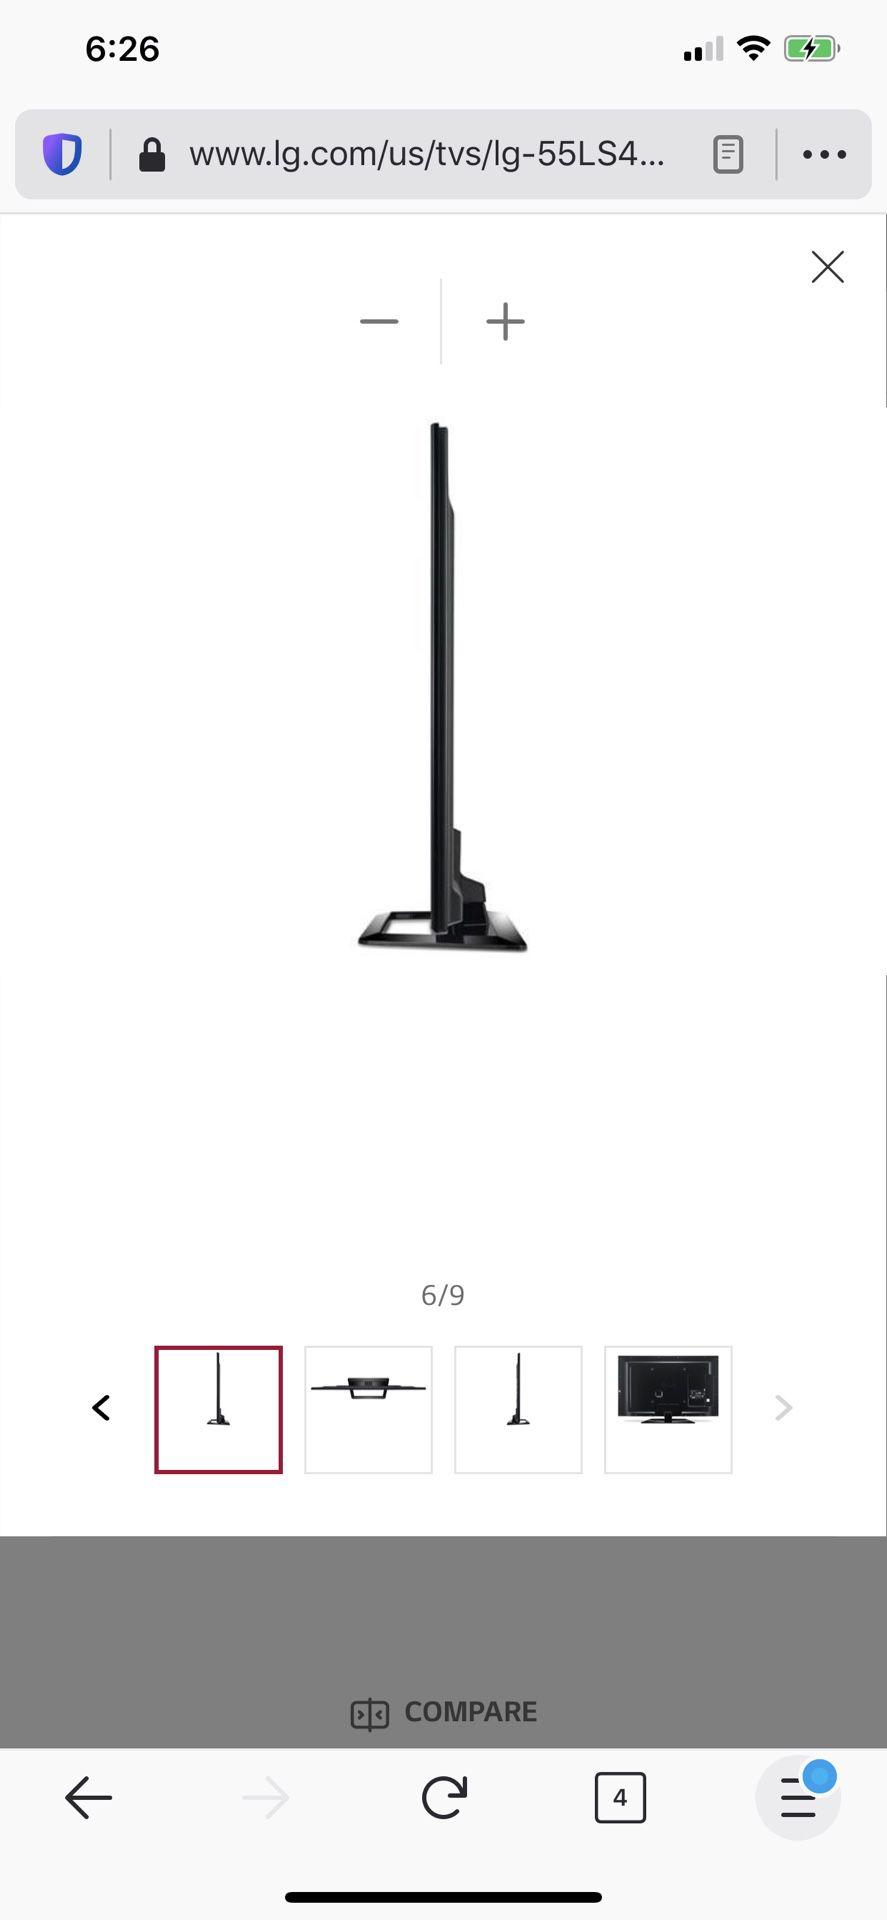 Lg 55 inch tv ls4600 model